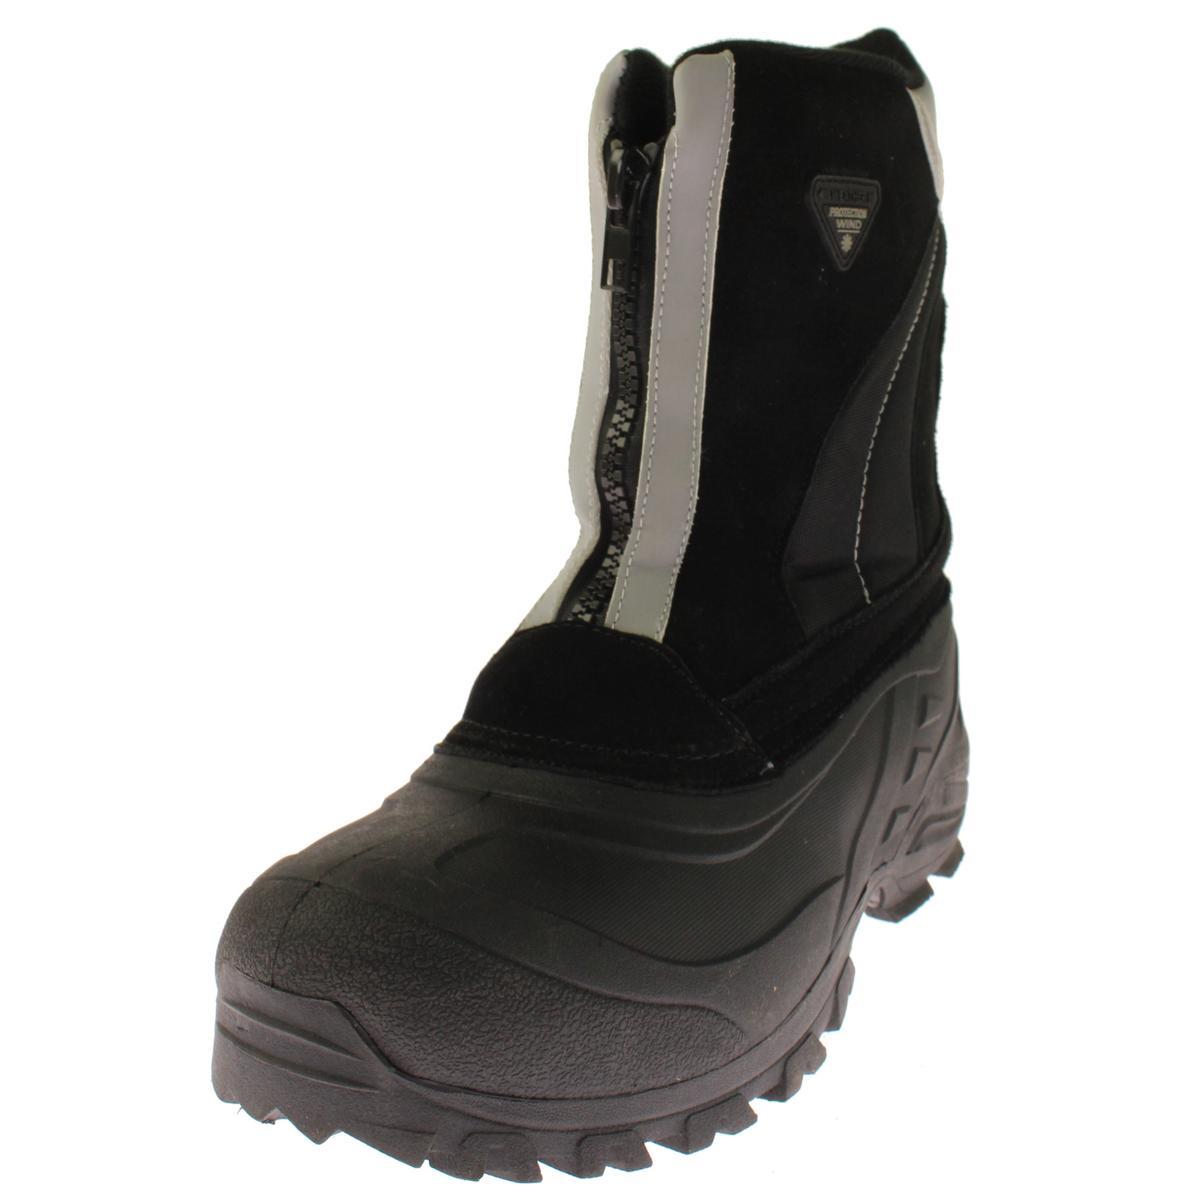 Totes 8921 Mens Jorge Black Suede Waterproof Snow Boots